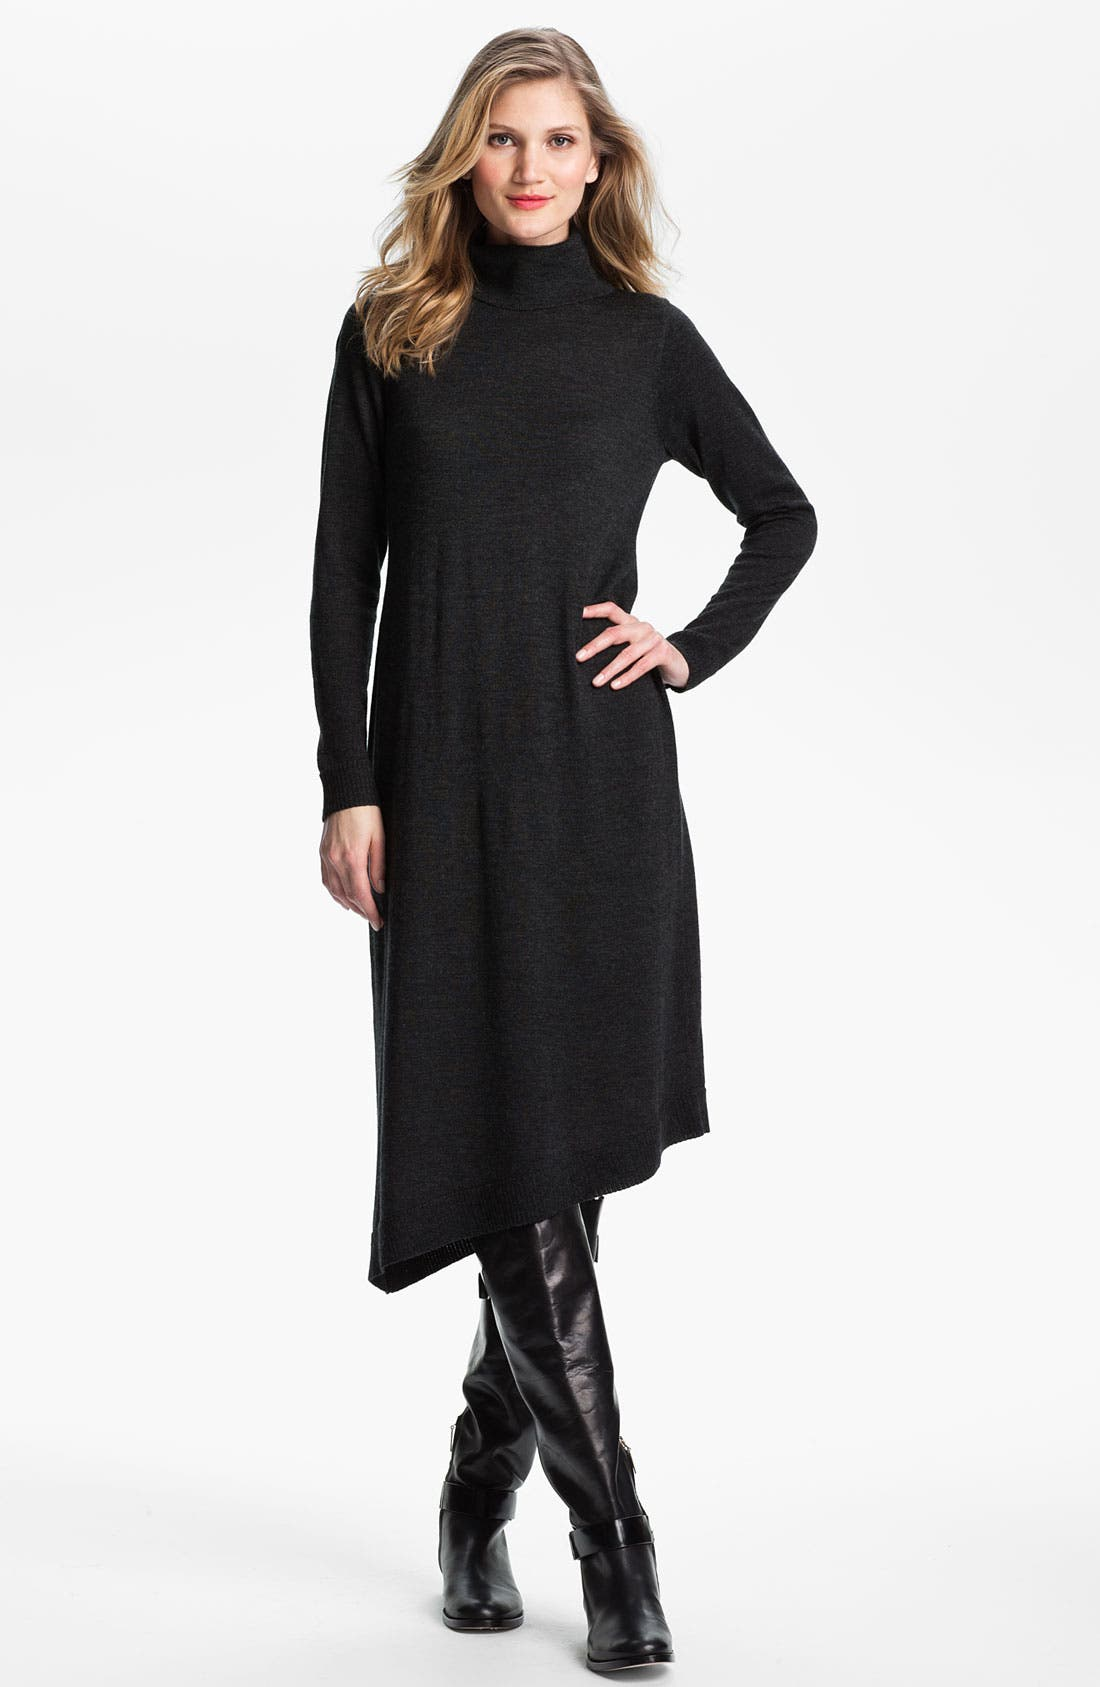 Alternate Image 1 Selected - Eileen Fisher Merino Jersey Sweater Dress